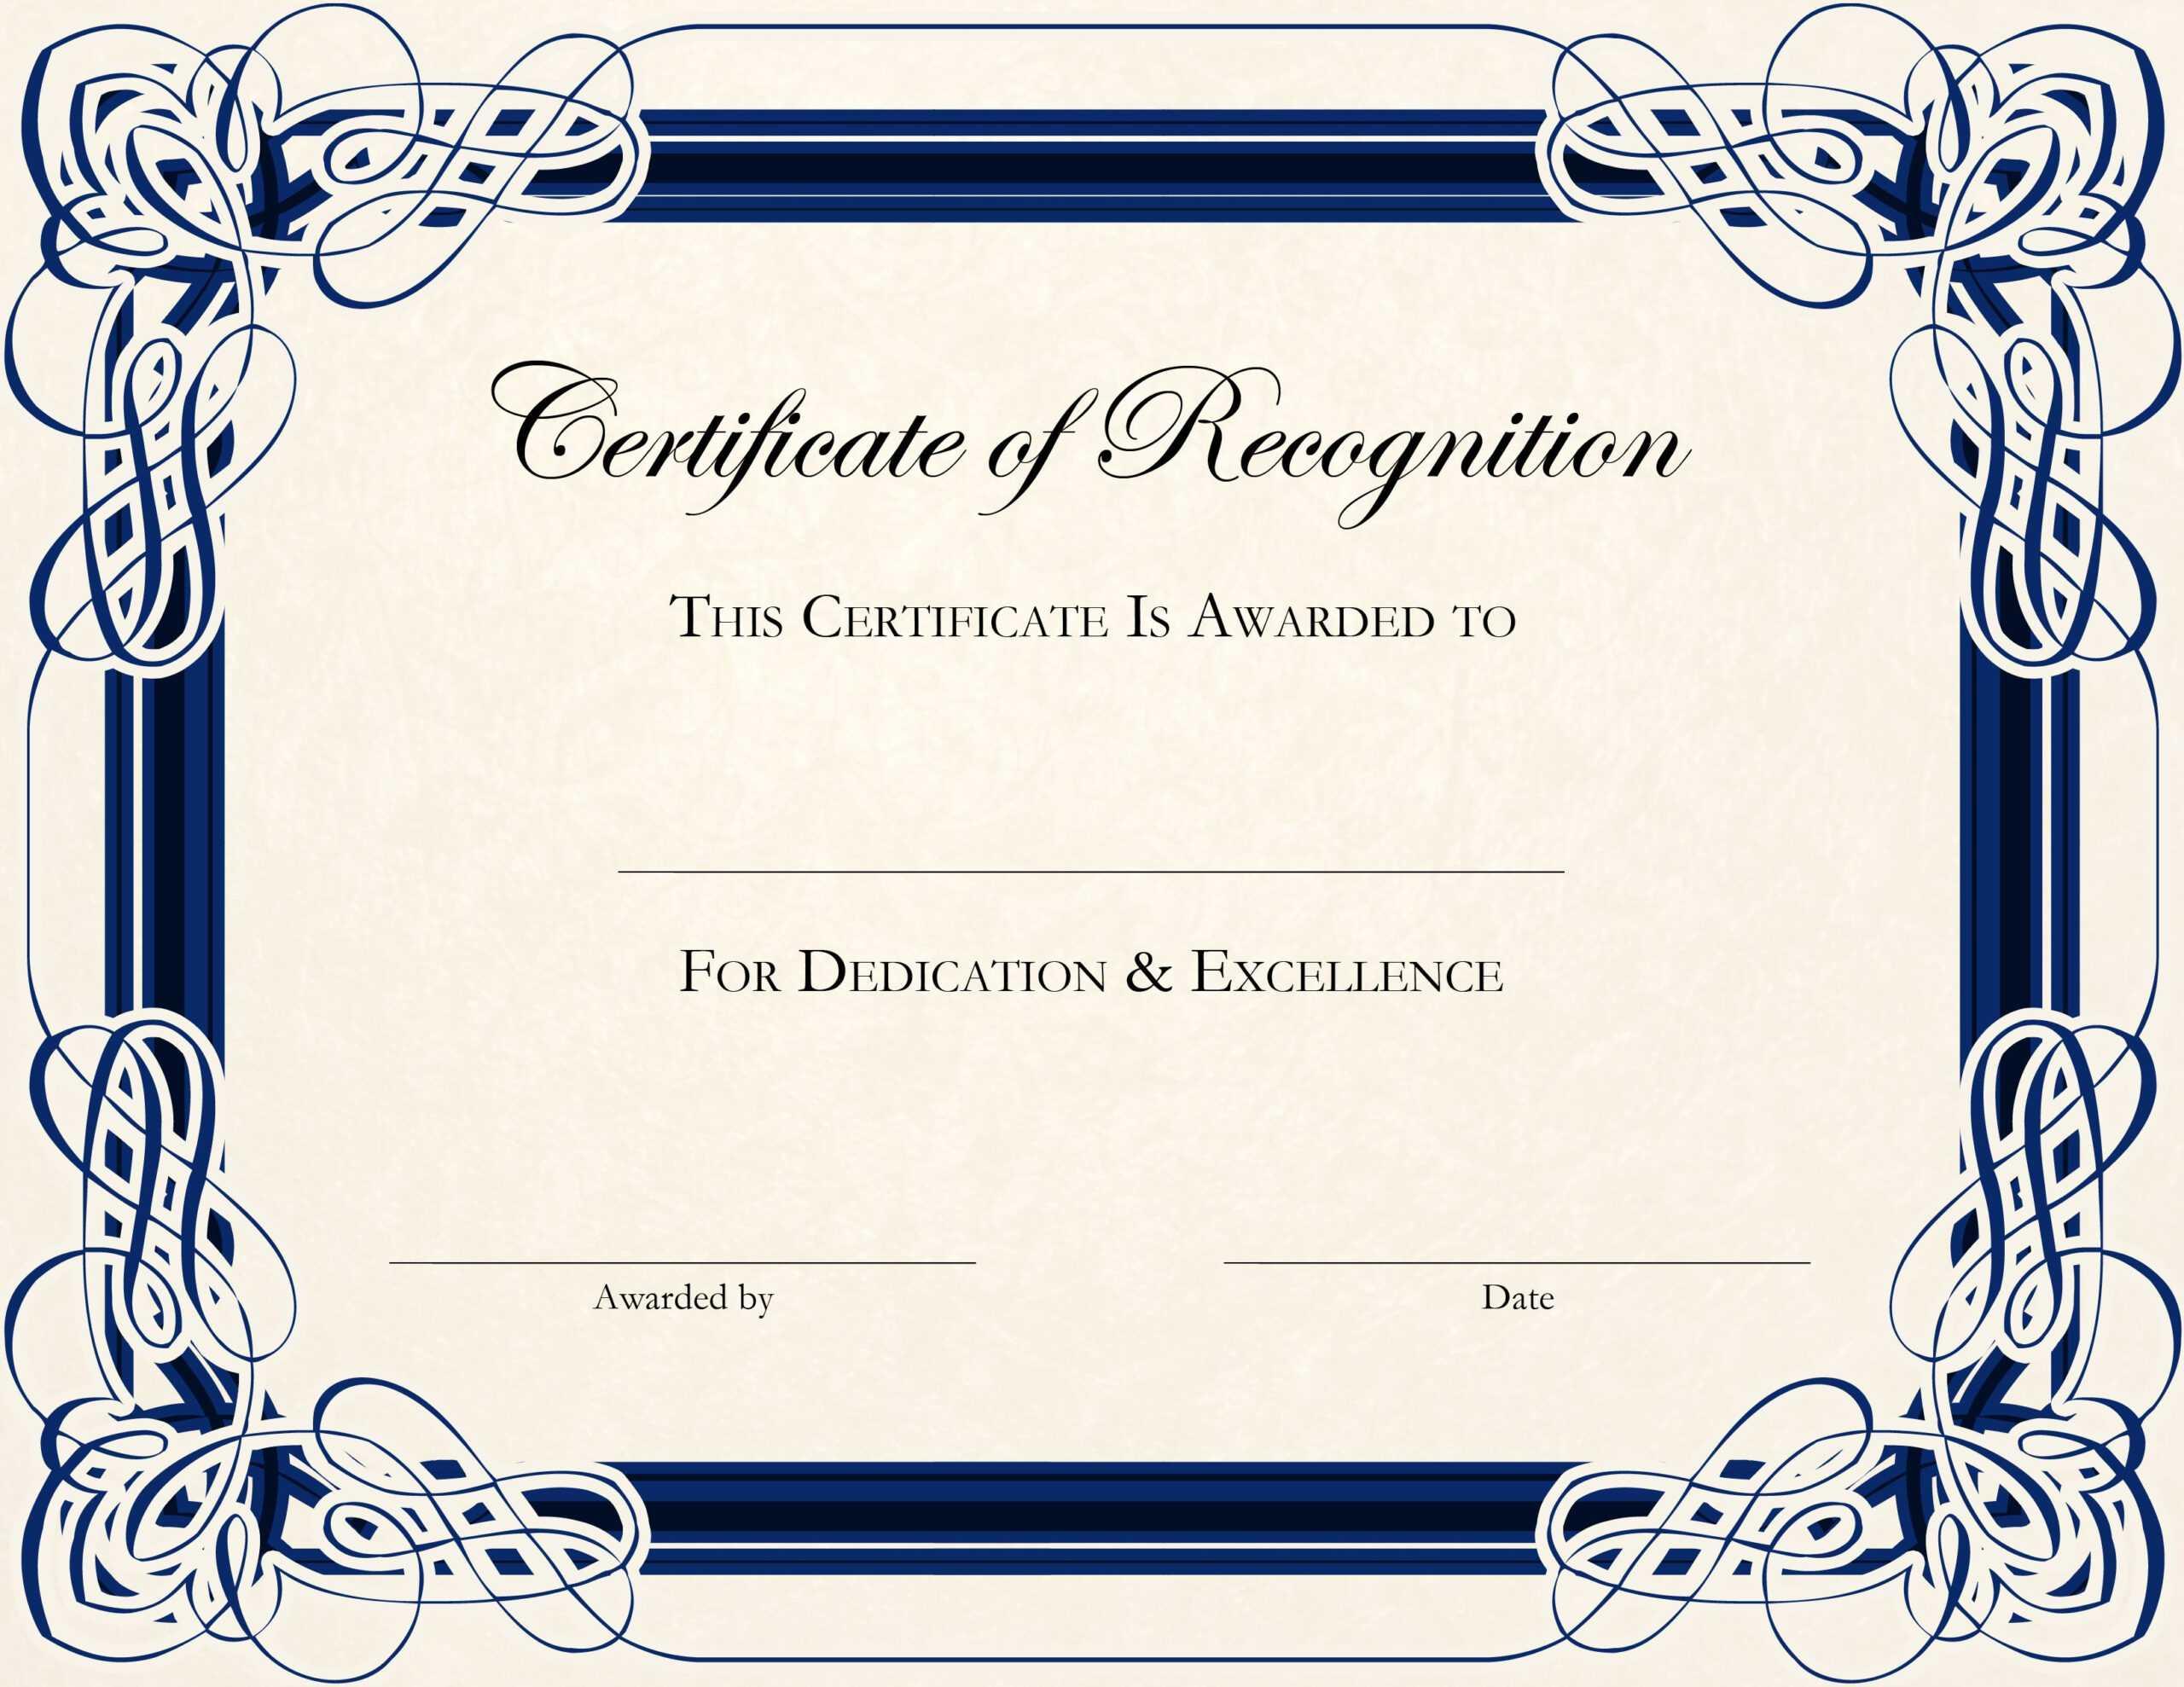 Certificate Template Designs Recognition Docs | Certificate With Art Certificate Template Free